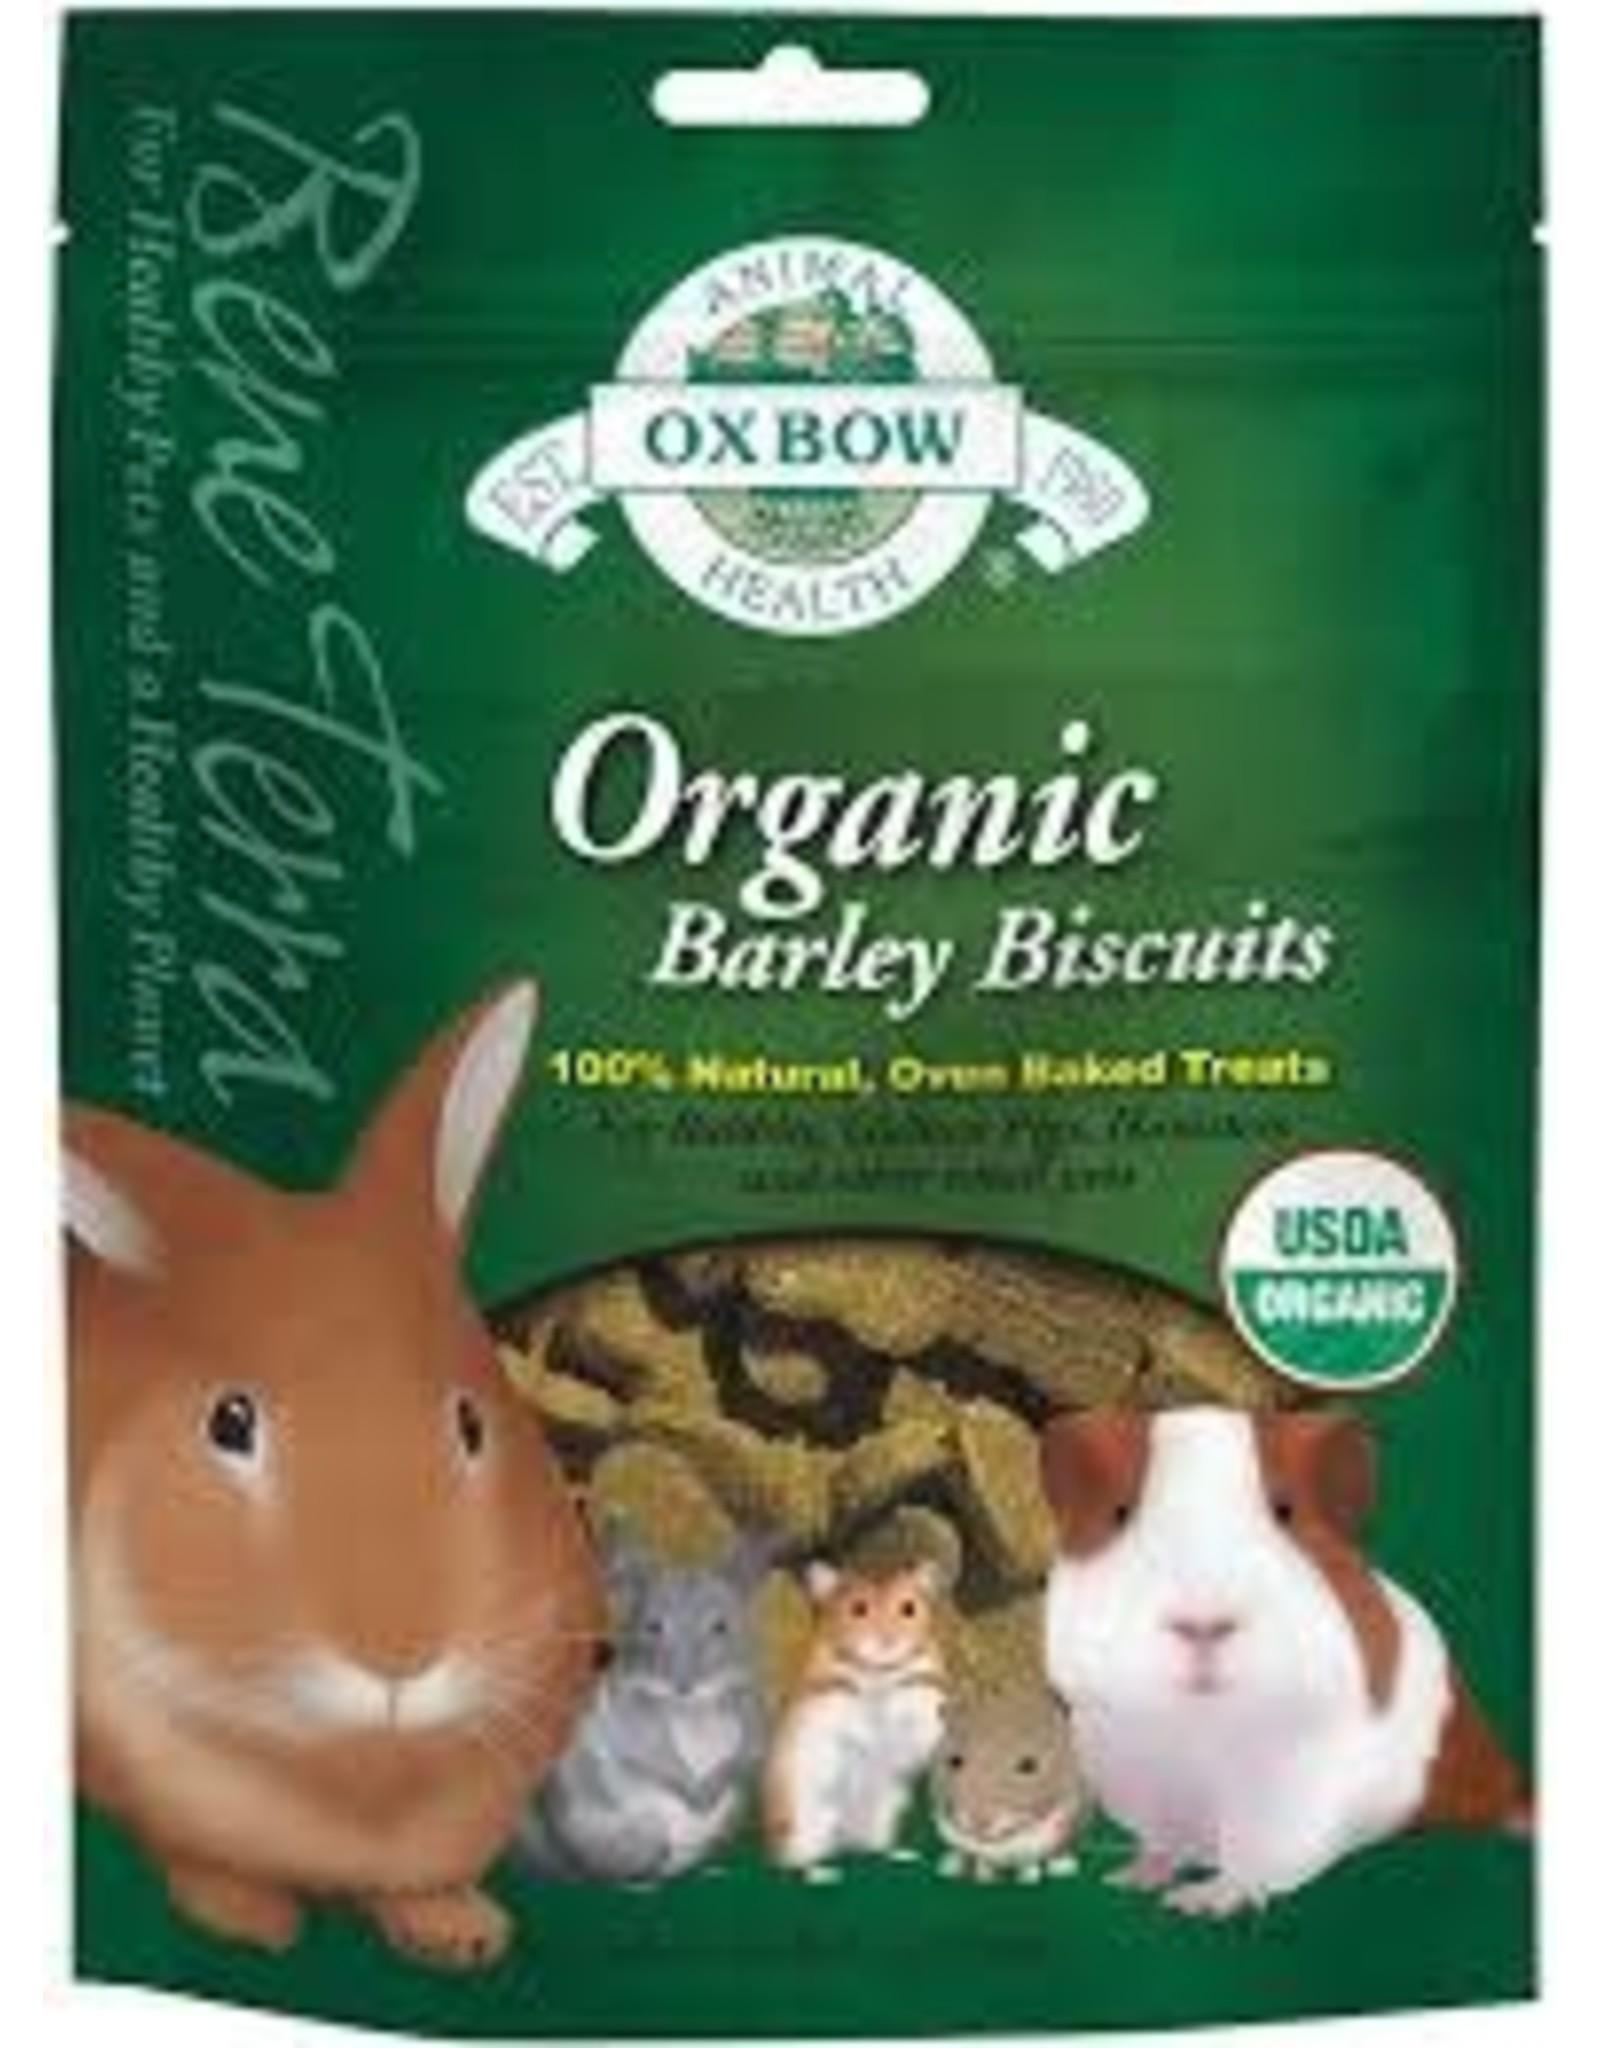 Oxbow Oxbow - Organic Barley Biscuits 75g